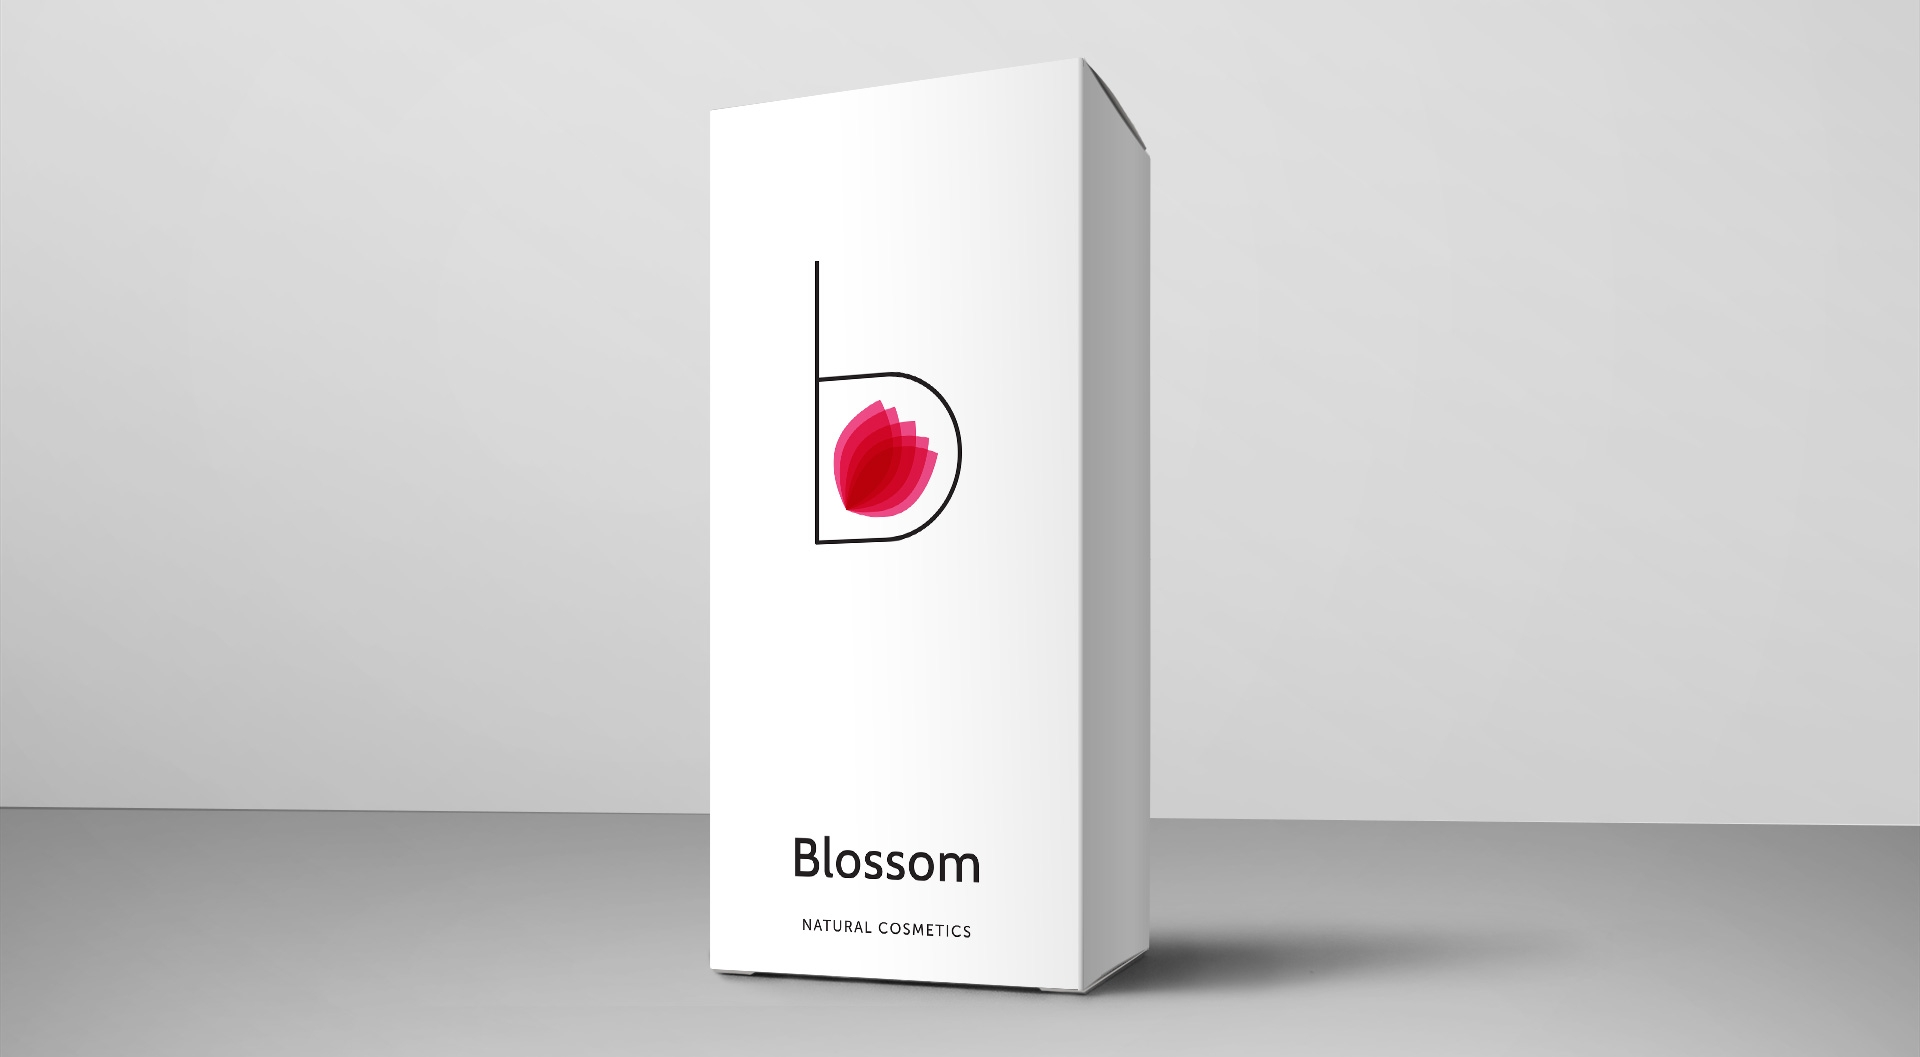 blossomcosmetics2